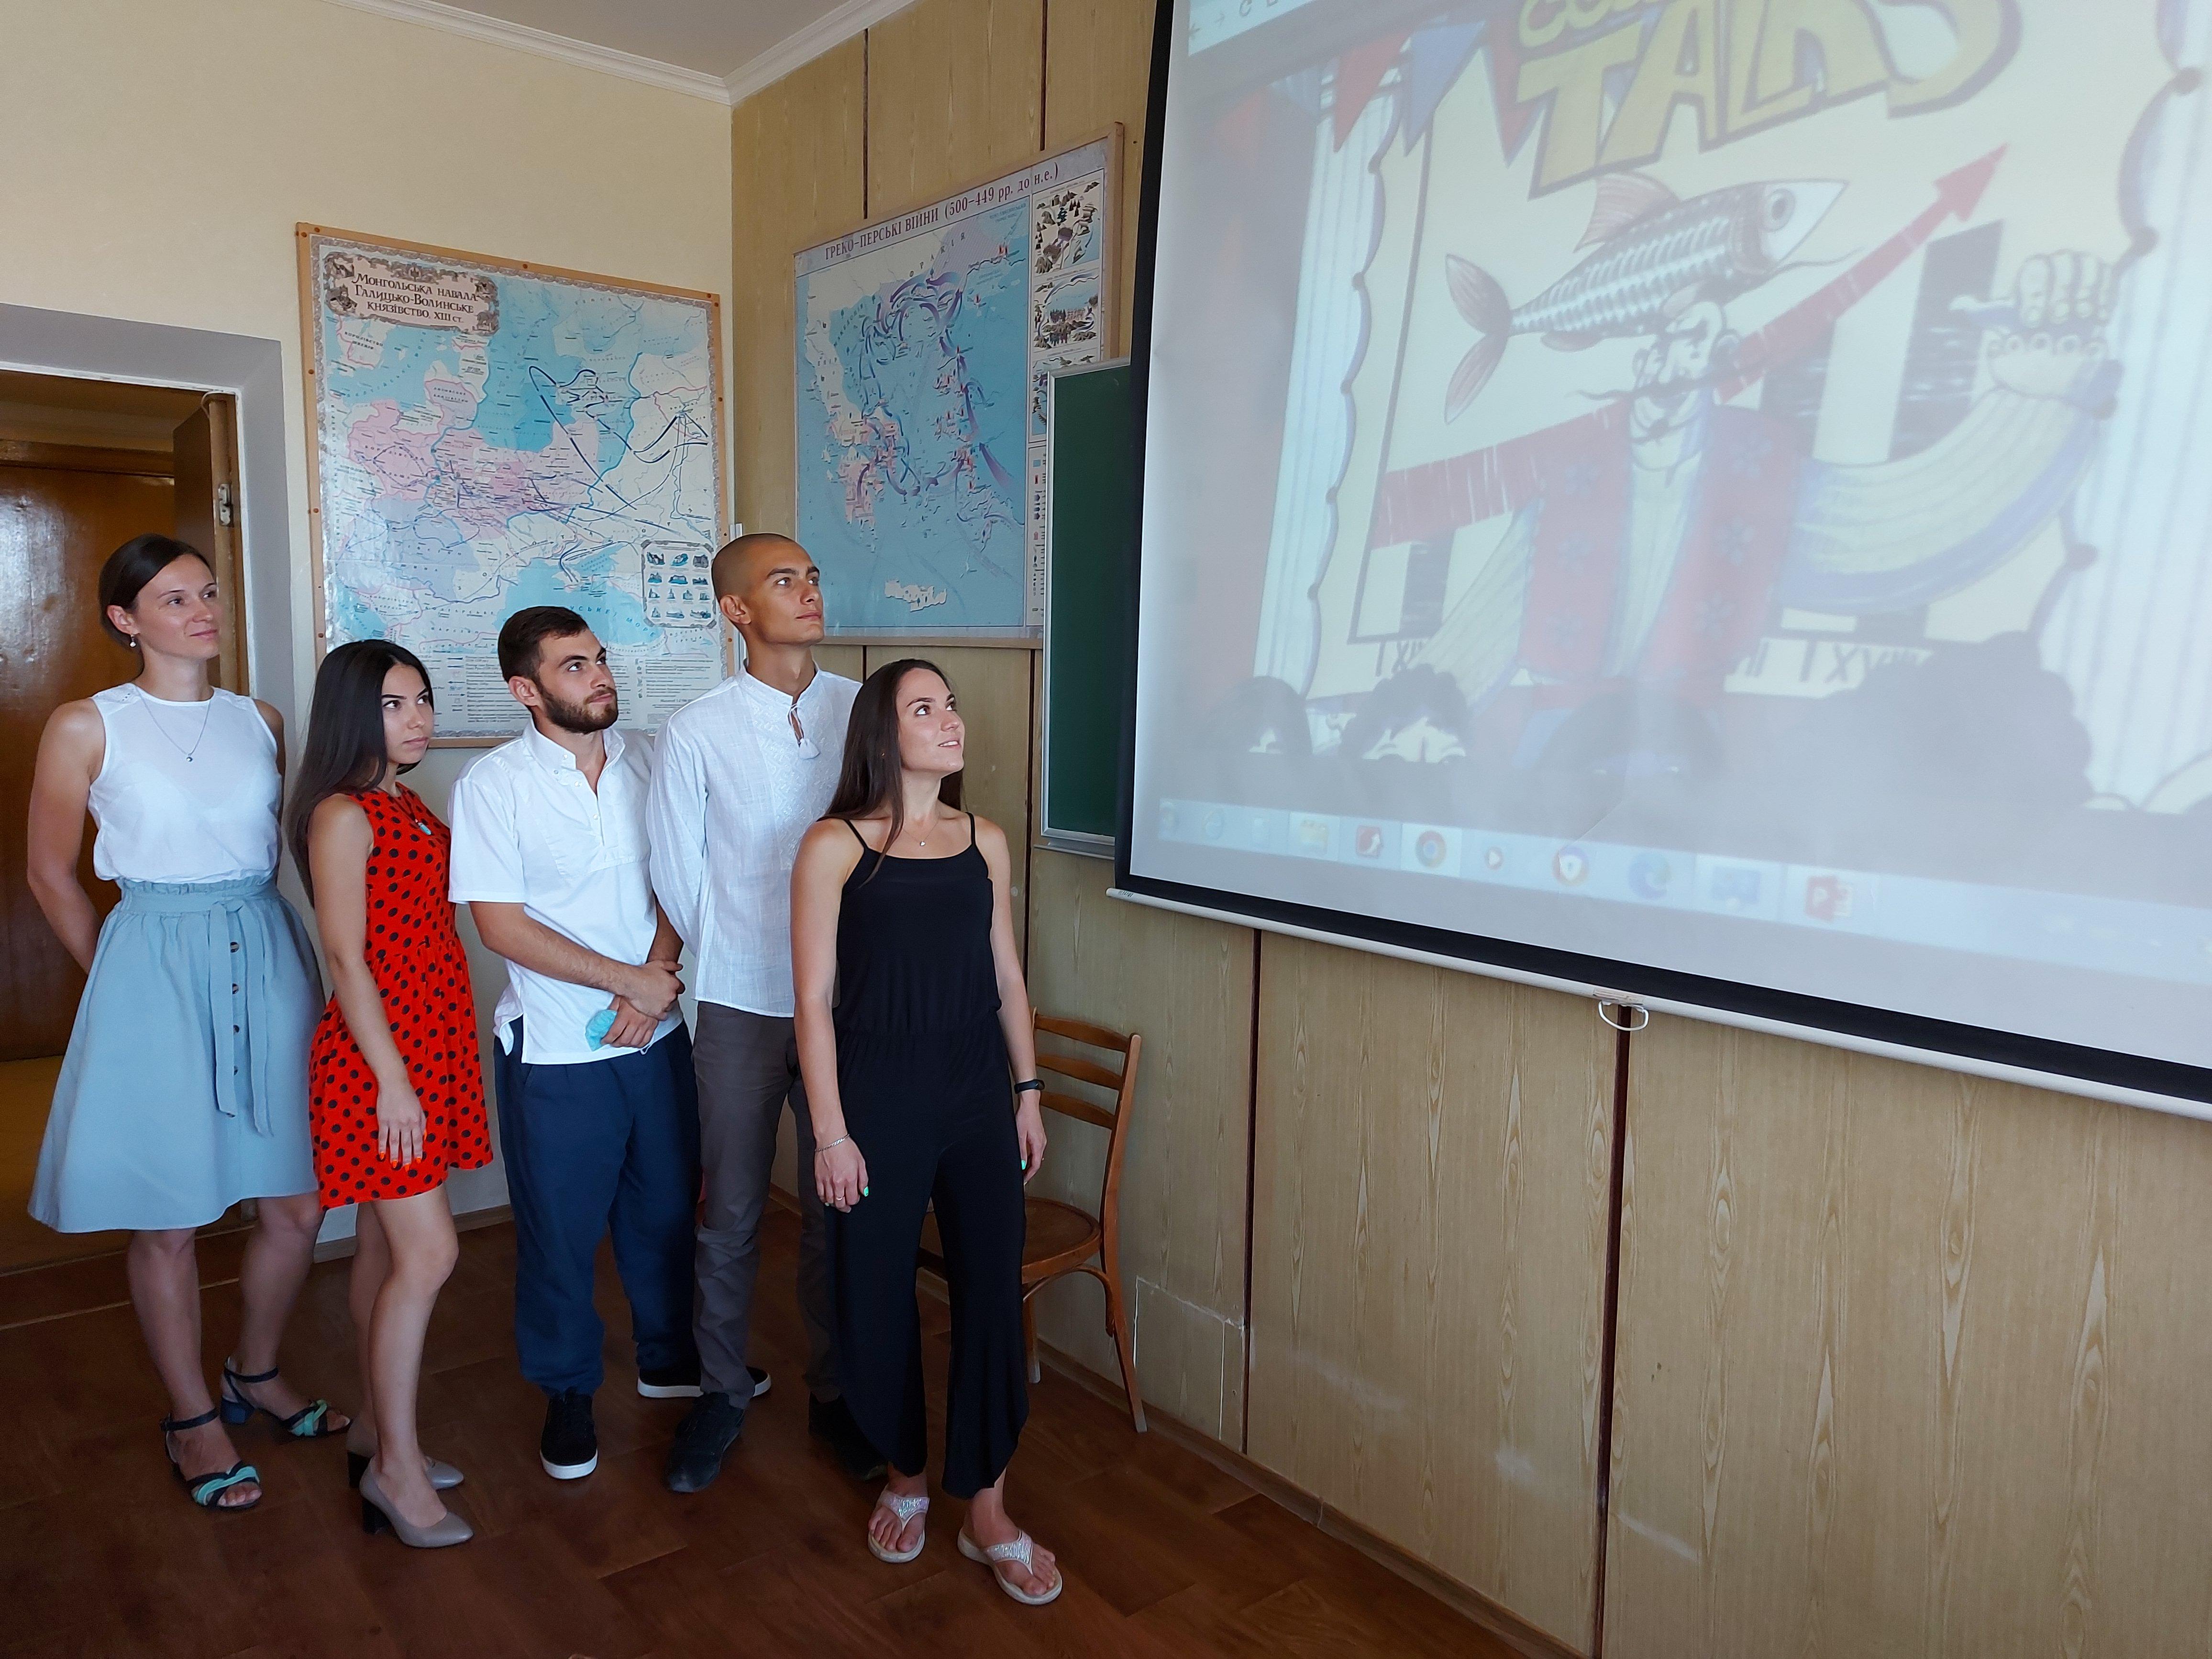 http://history.mdu.in.ua/NEWS/2020/20200901_103029.jpg